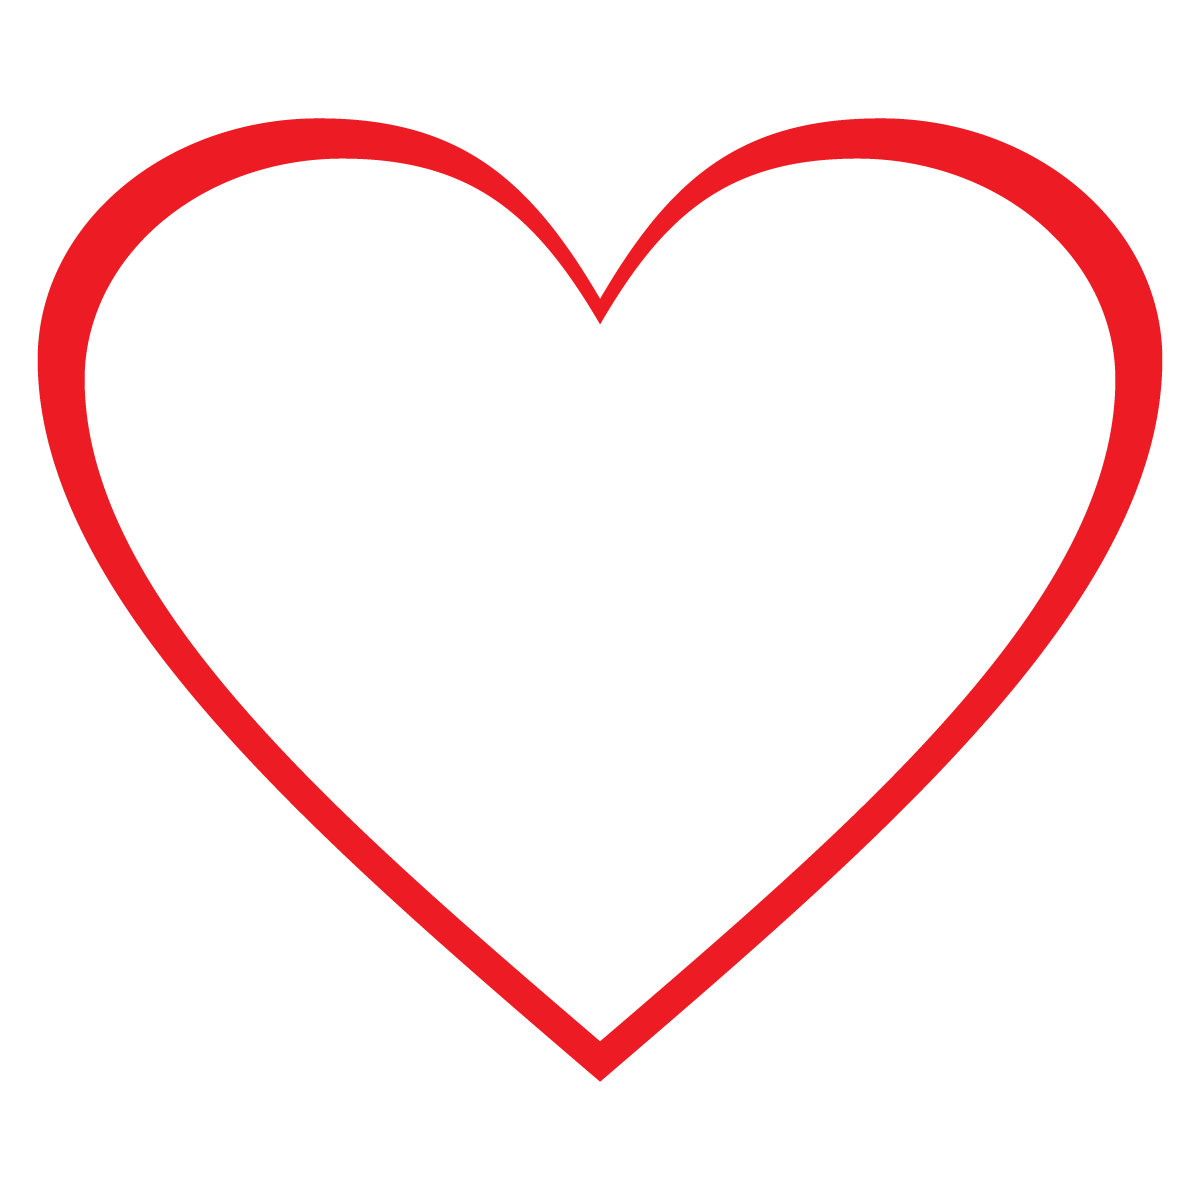 1200x1200 Loveheart Clipart